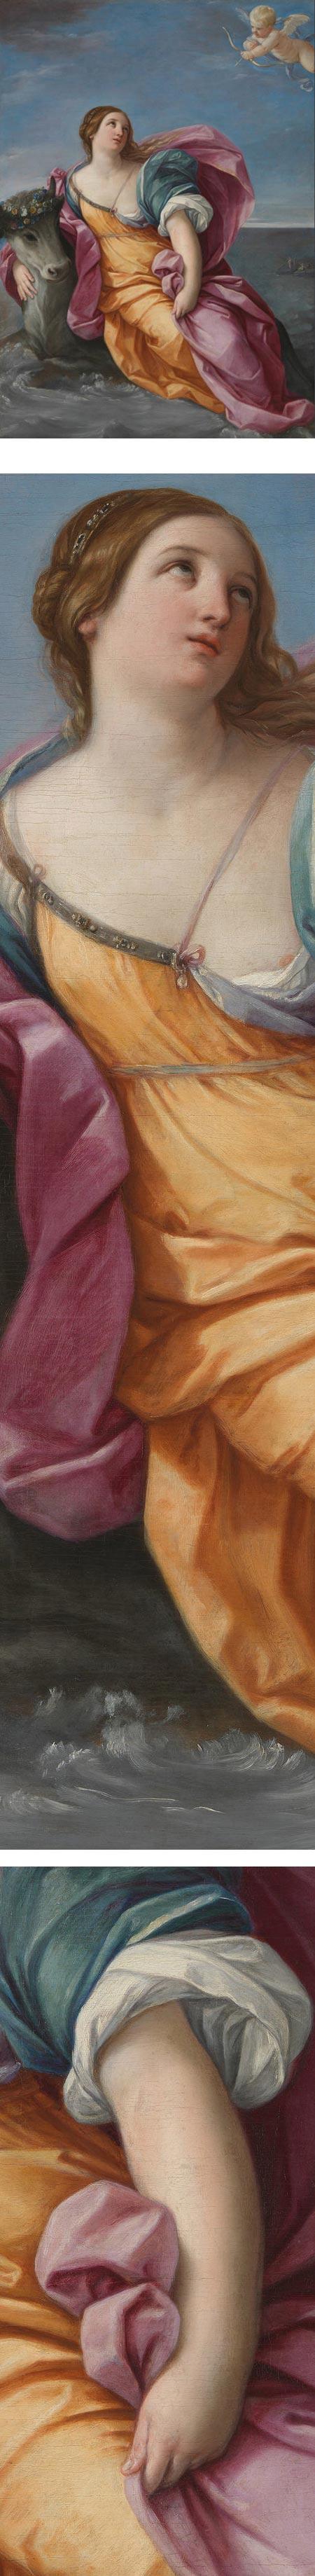 The Rape or Europa, Guido Reni; National Gallery, London